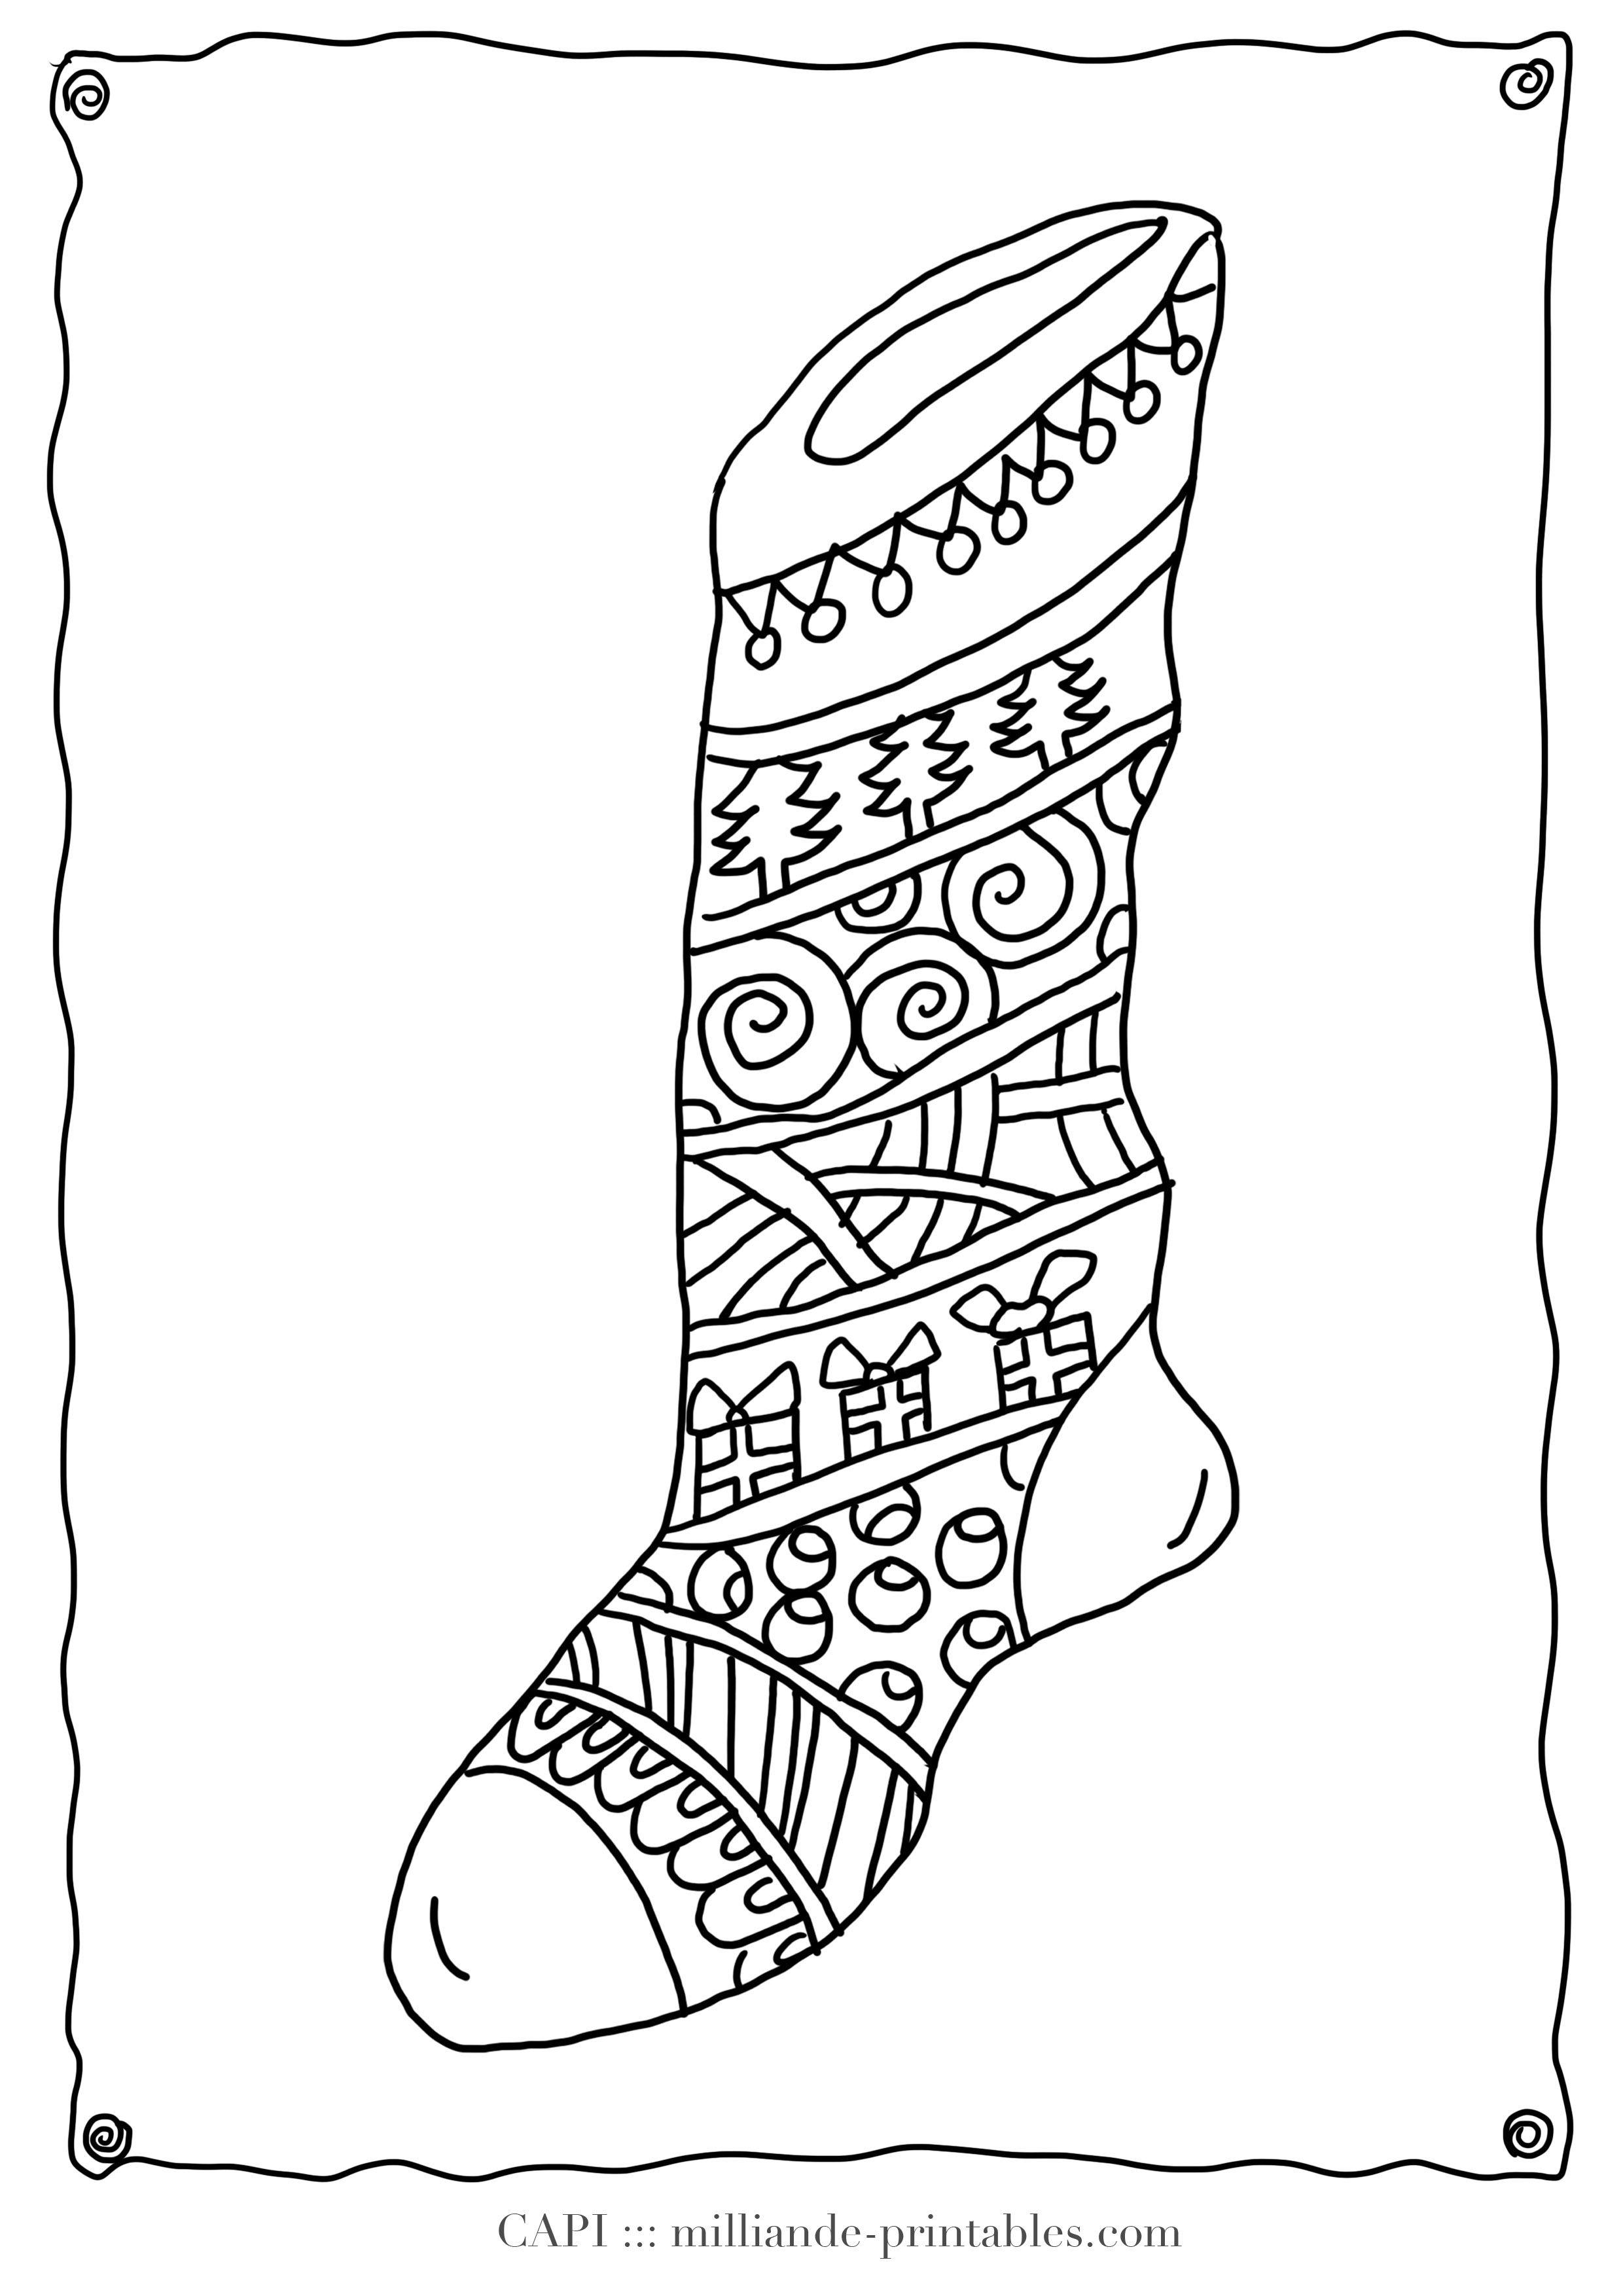 Christmas Coloring Page Stocking Milliande S Original